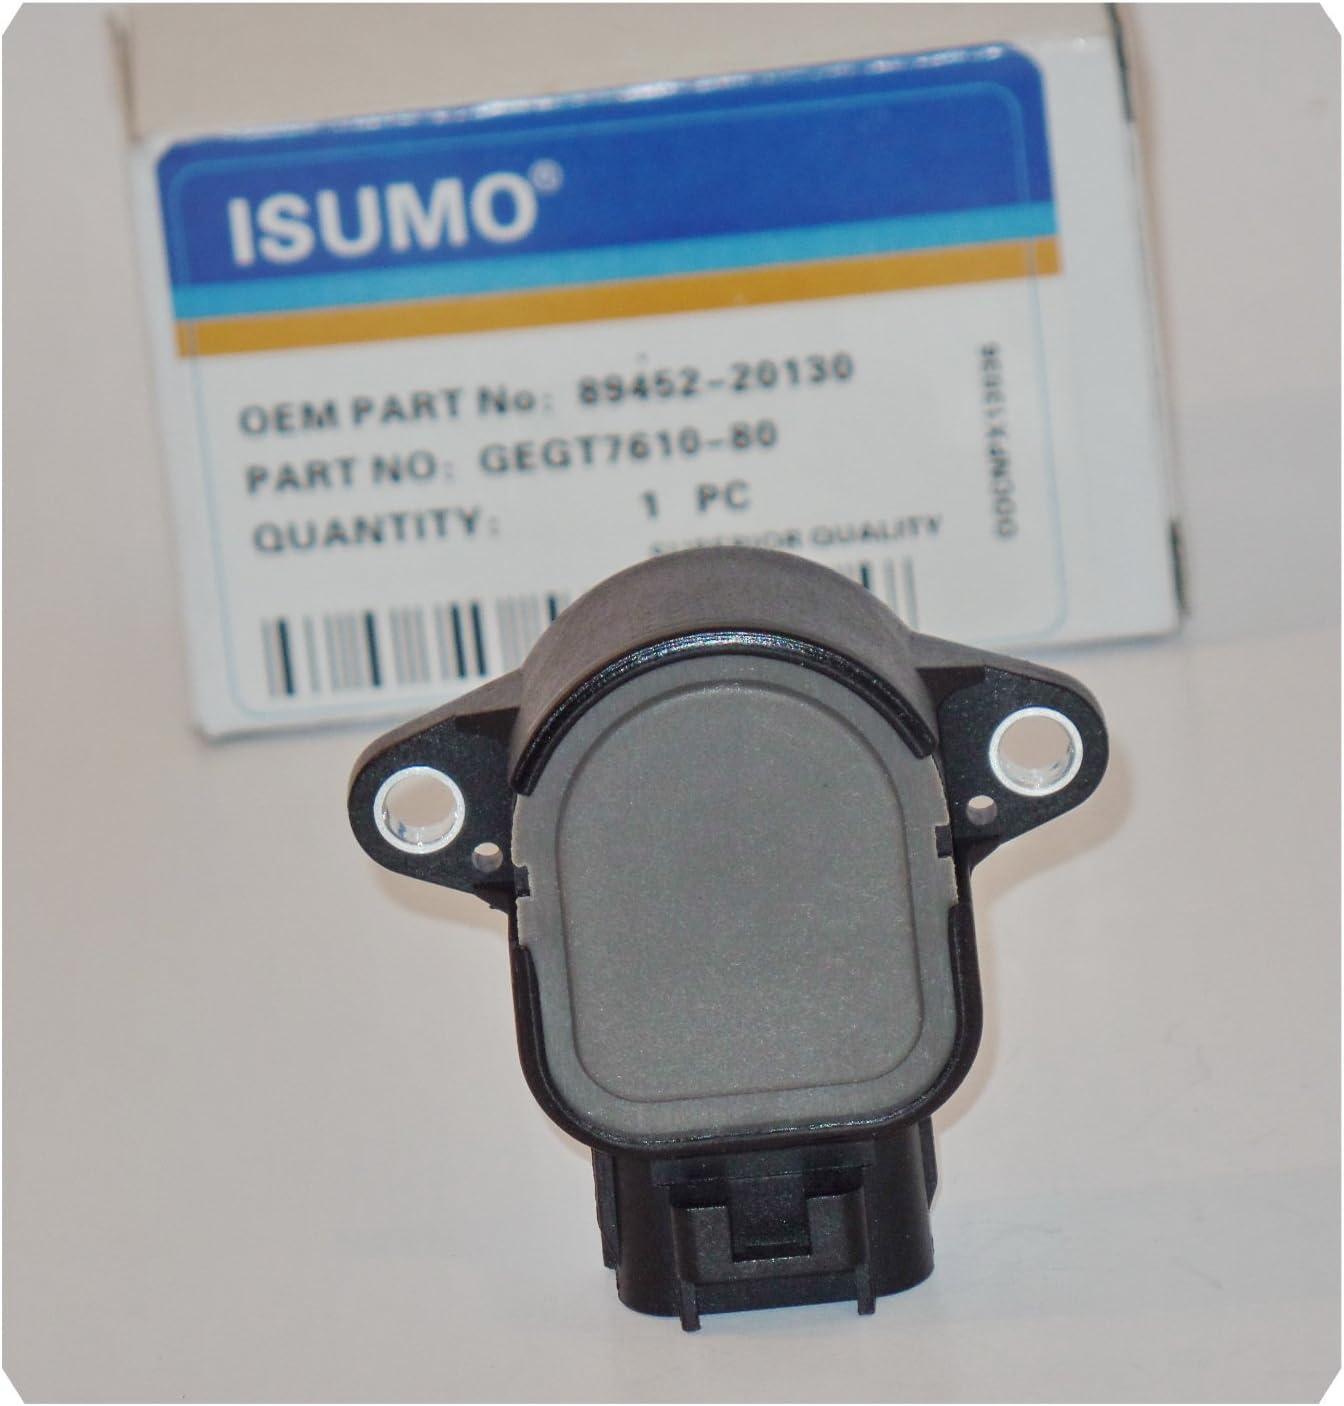 Throttle Position Sensor TPS 89452-20130 Fit Toyota Corolla Echo Scion Subaru